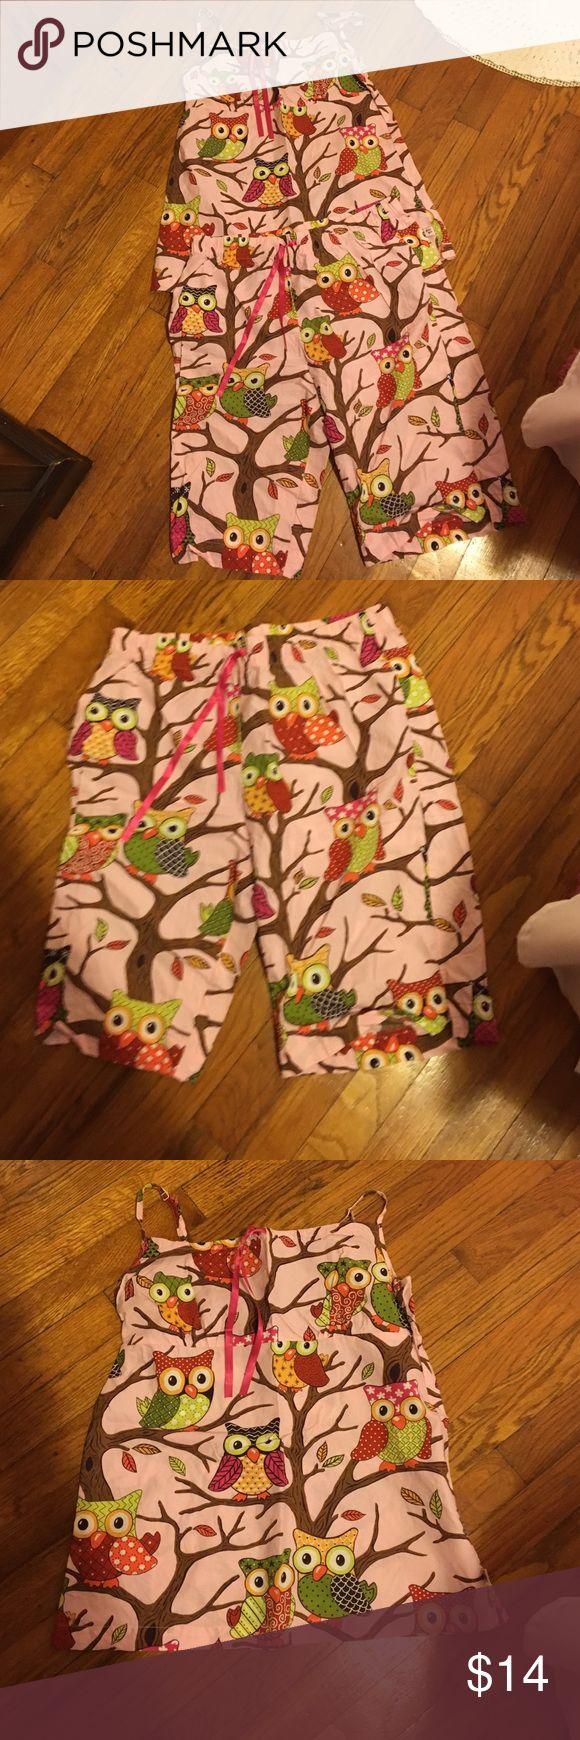 1000 ideas about nick and nora pajamas on pinterest flannel pyjamas